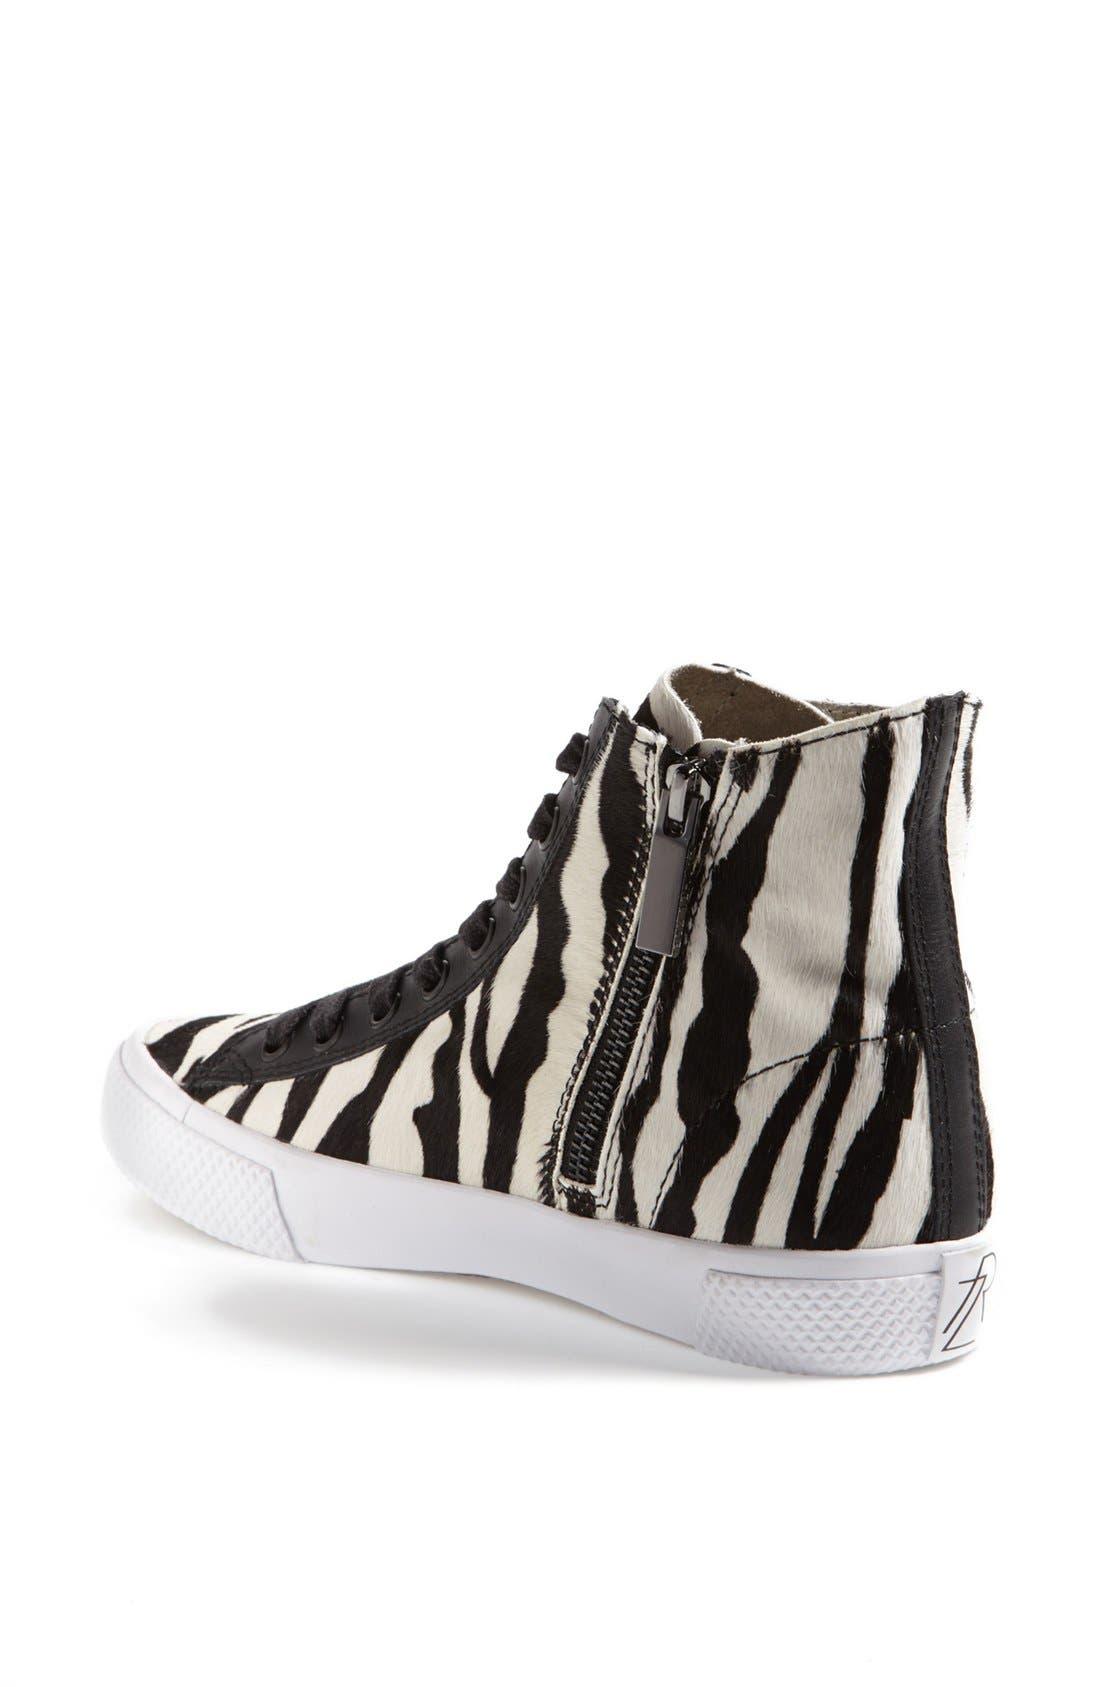 Alternate Image 2  - Rachel Zoe 'Barret' Zebra Print Calf Hair Sneaker (Online Only)